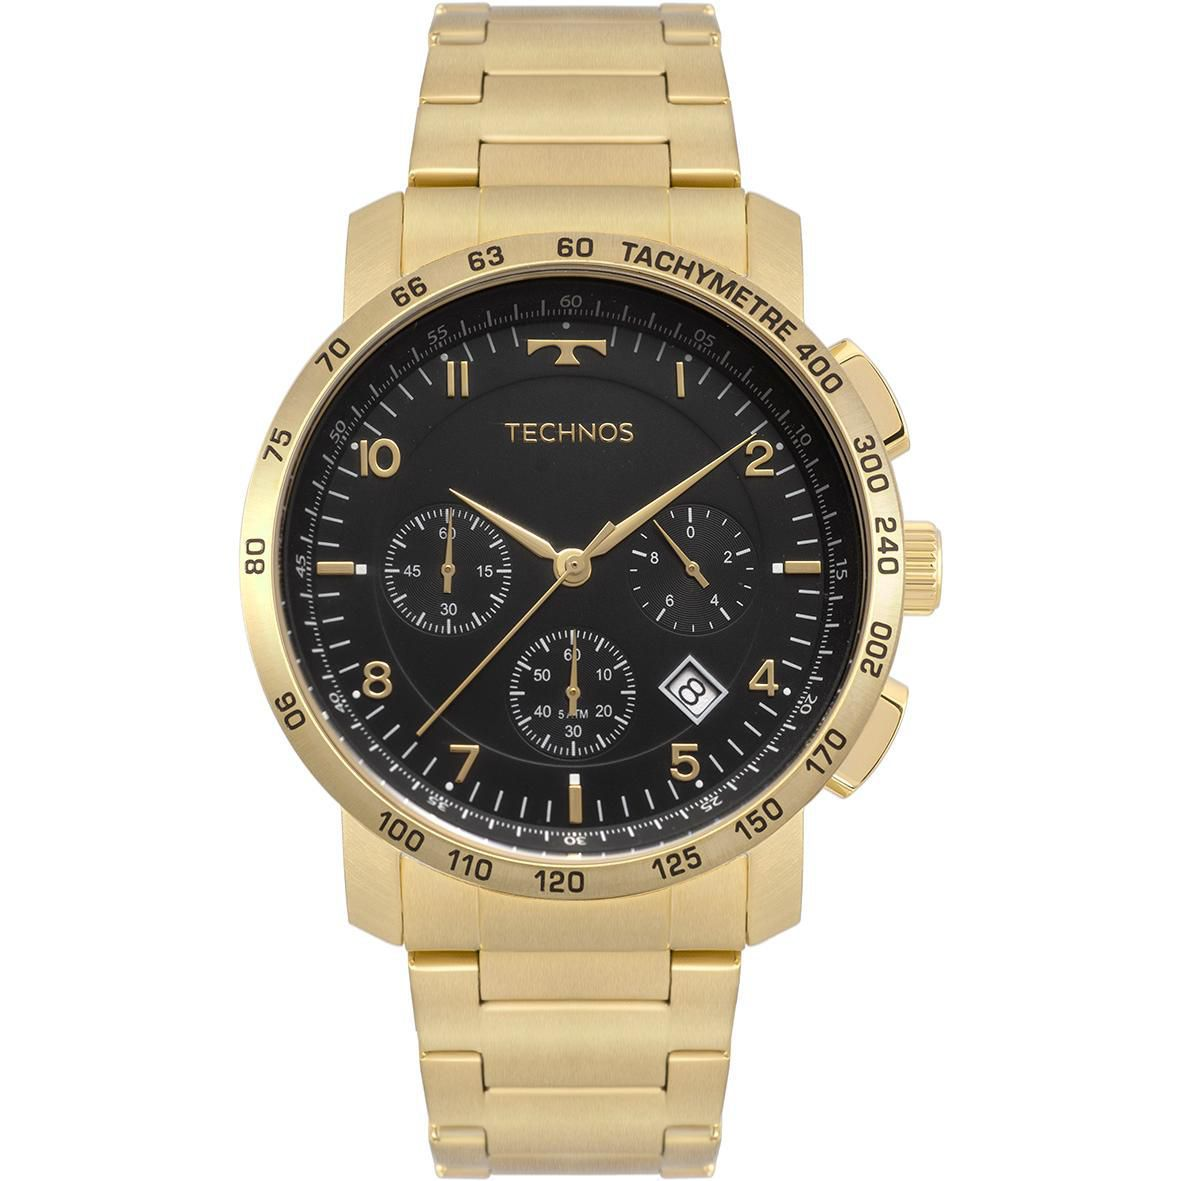 Relógio Masculino Technos Performance Skymaster 6S20AA/4P 46mm Aço Dourado